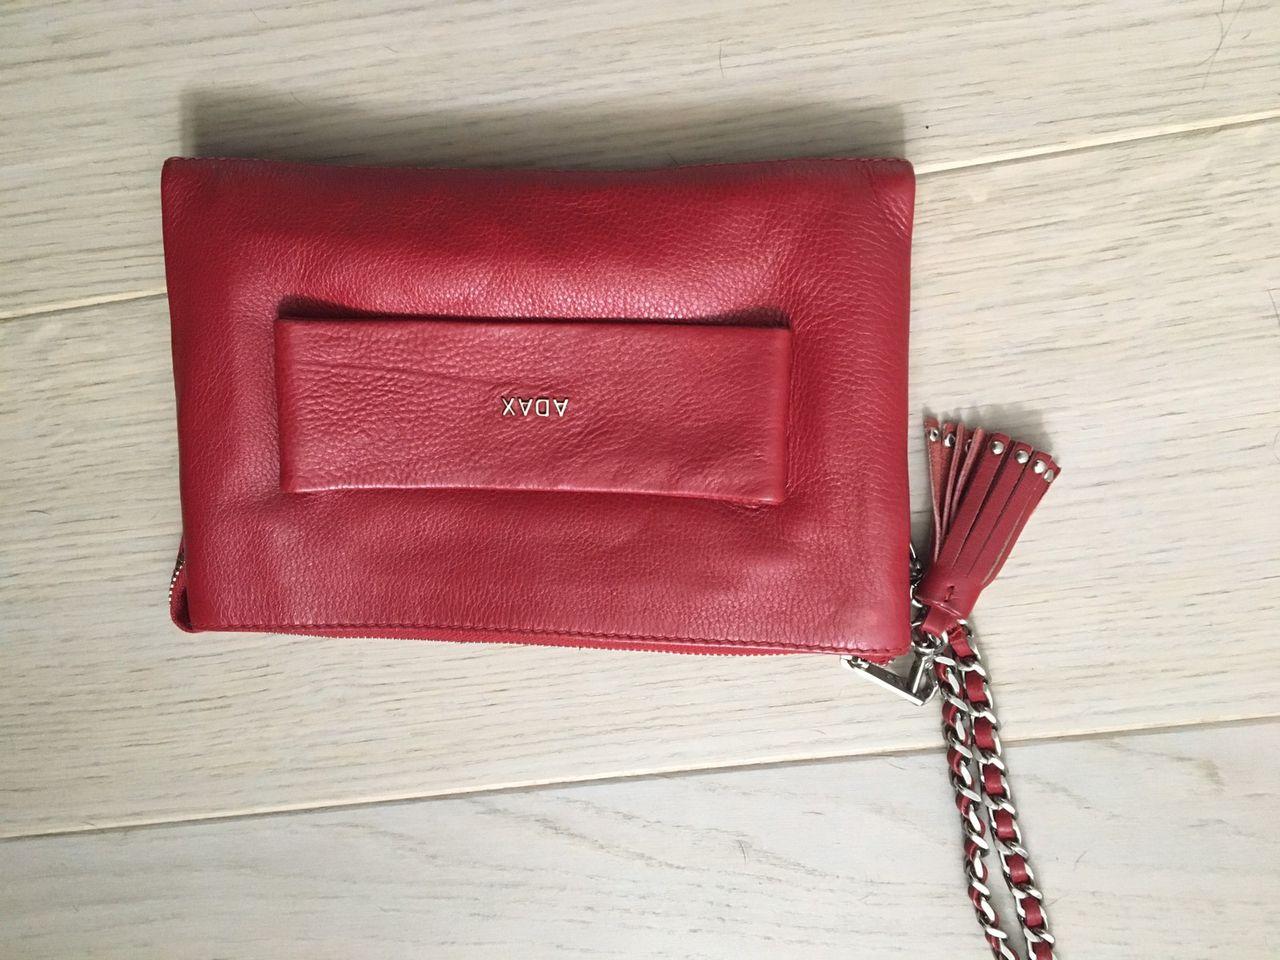 Adax clutch i rødt skinn | FINN.no